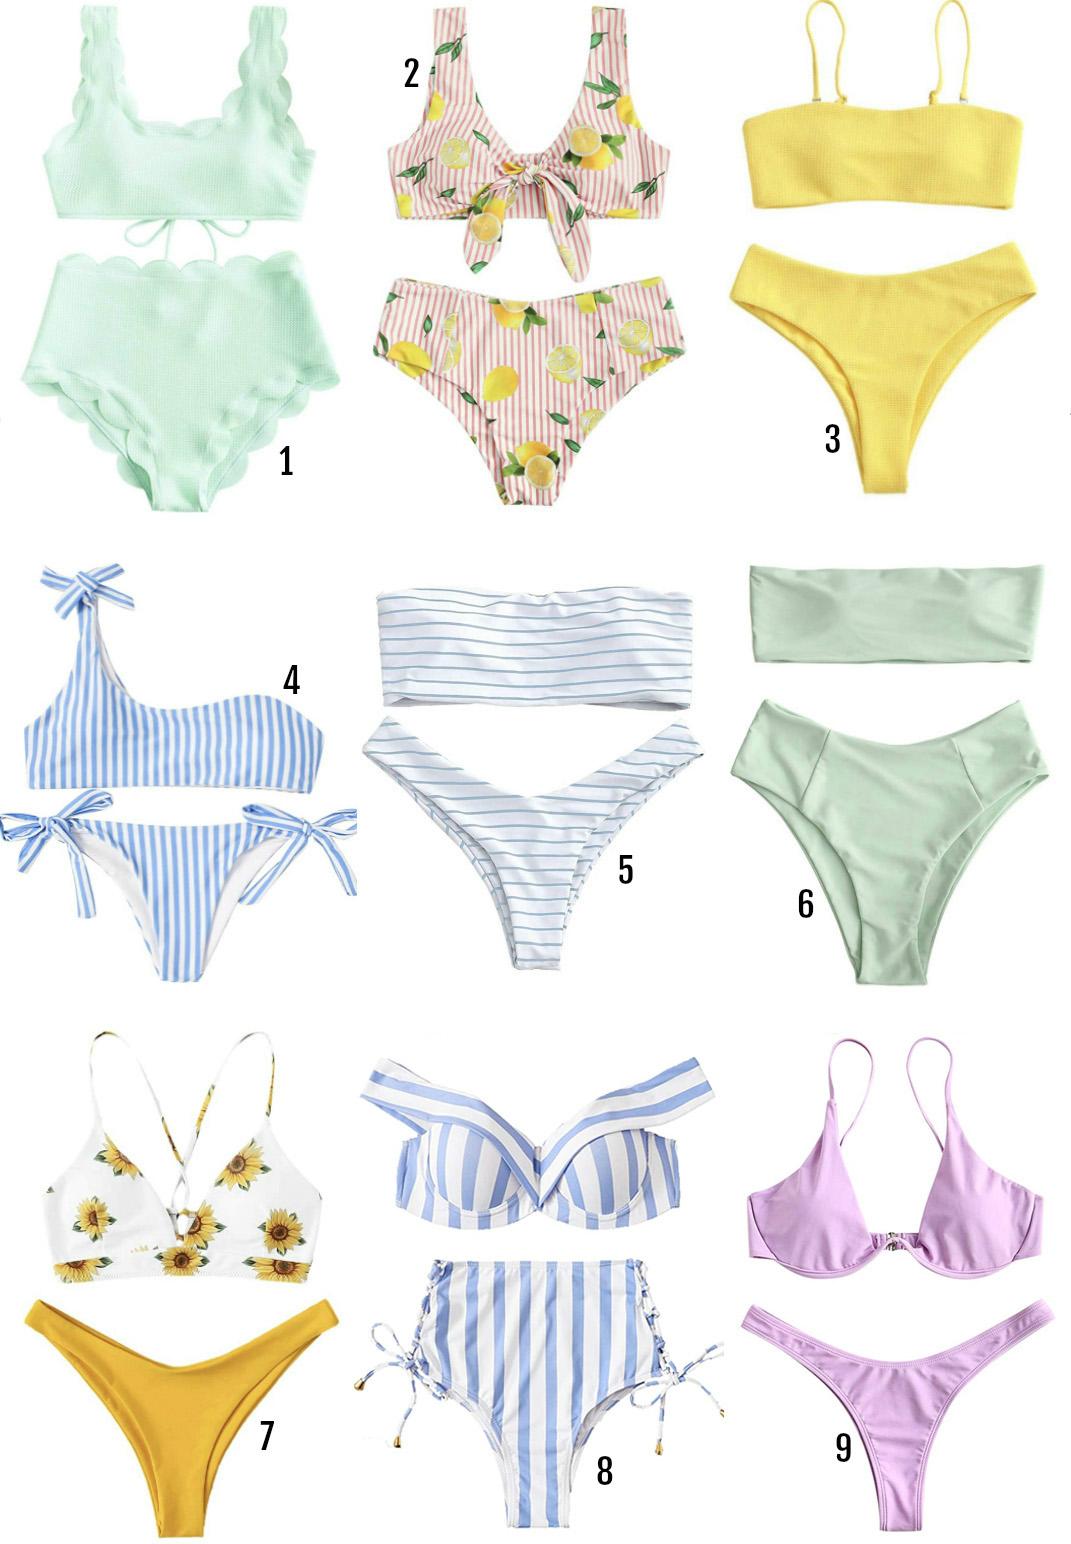 canada bathing suits | Mash elle beauty and fashion blogger | style | swimwear | summer fashion